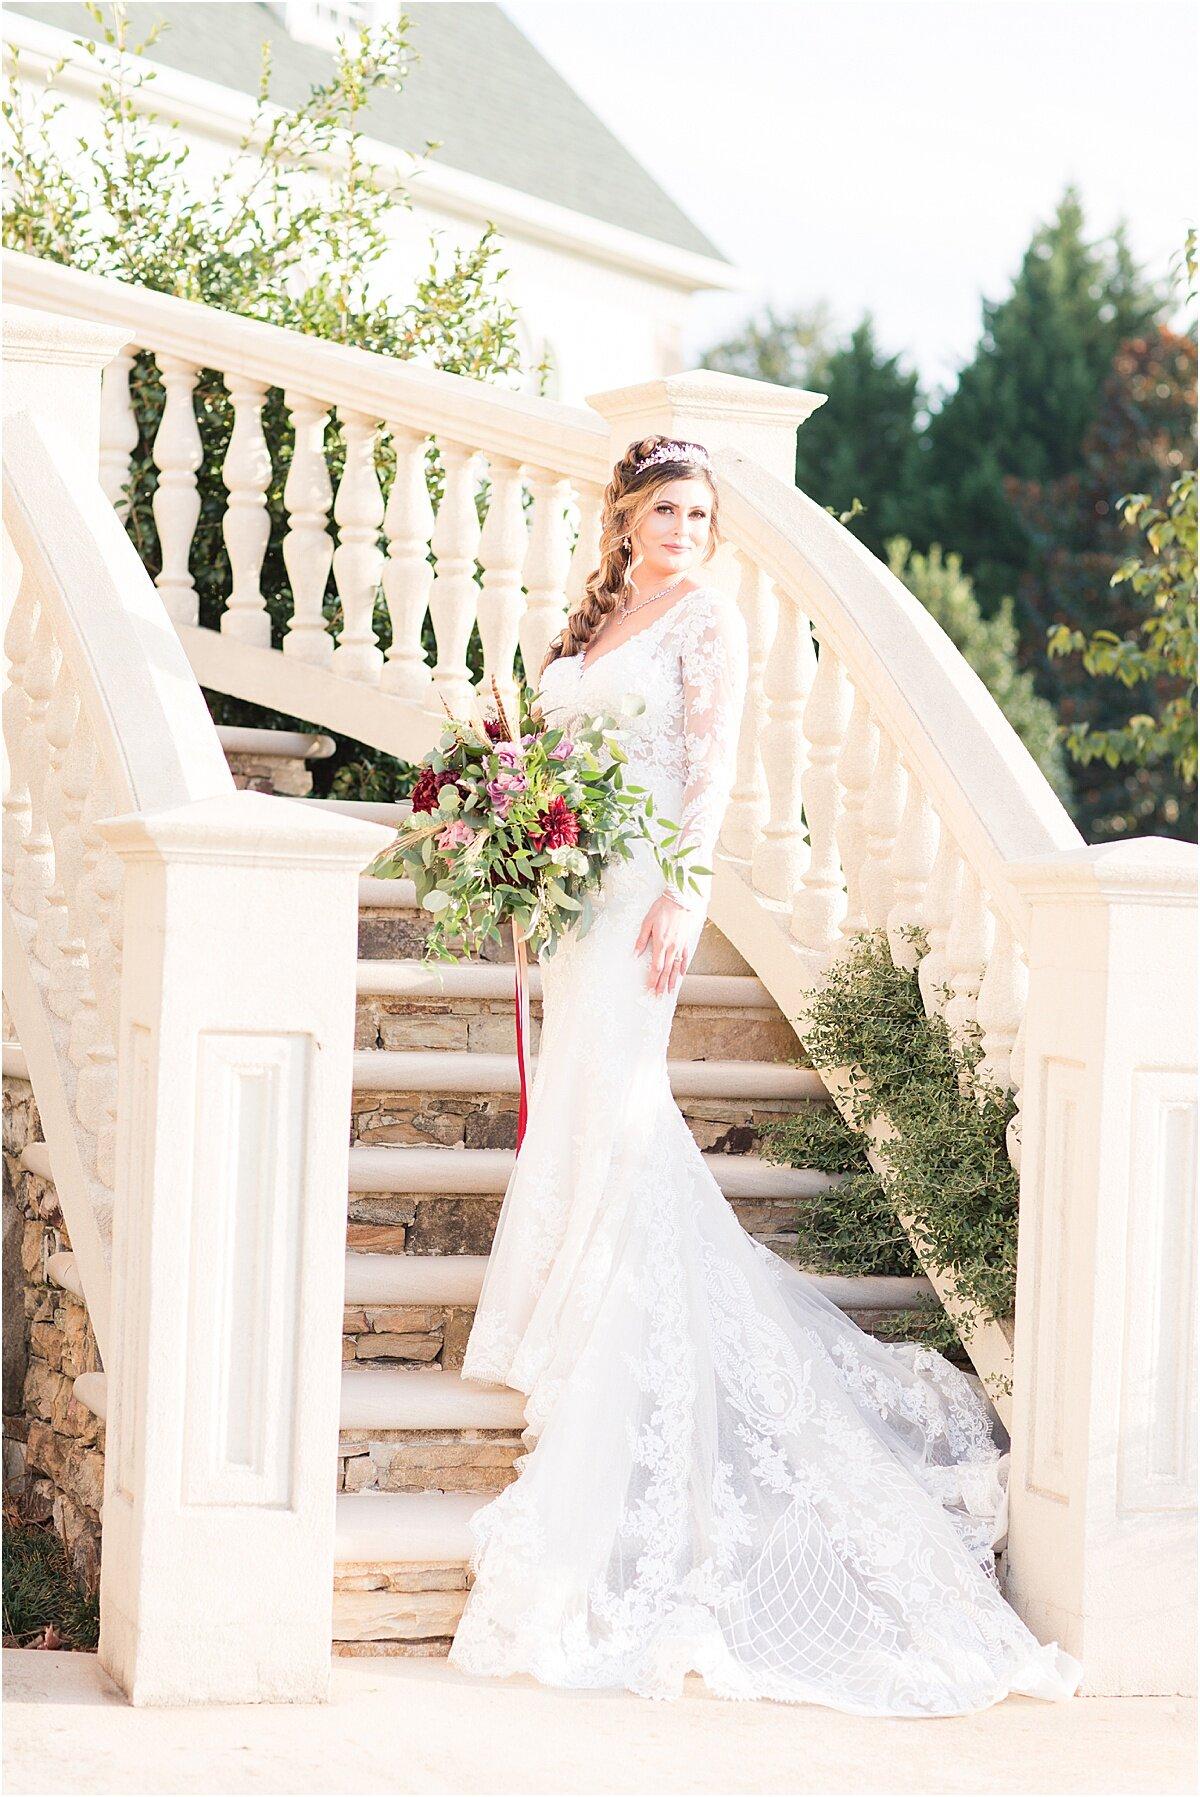 Jersey_Ga_Wedding_Venues_Holly_L_Robbins_Photography_0092.jpg